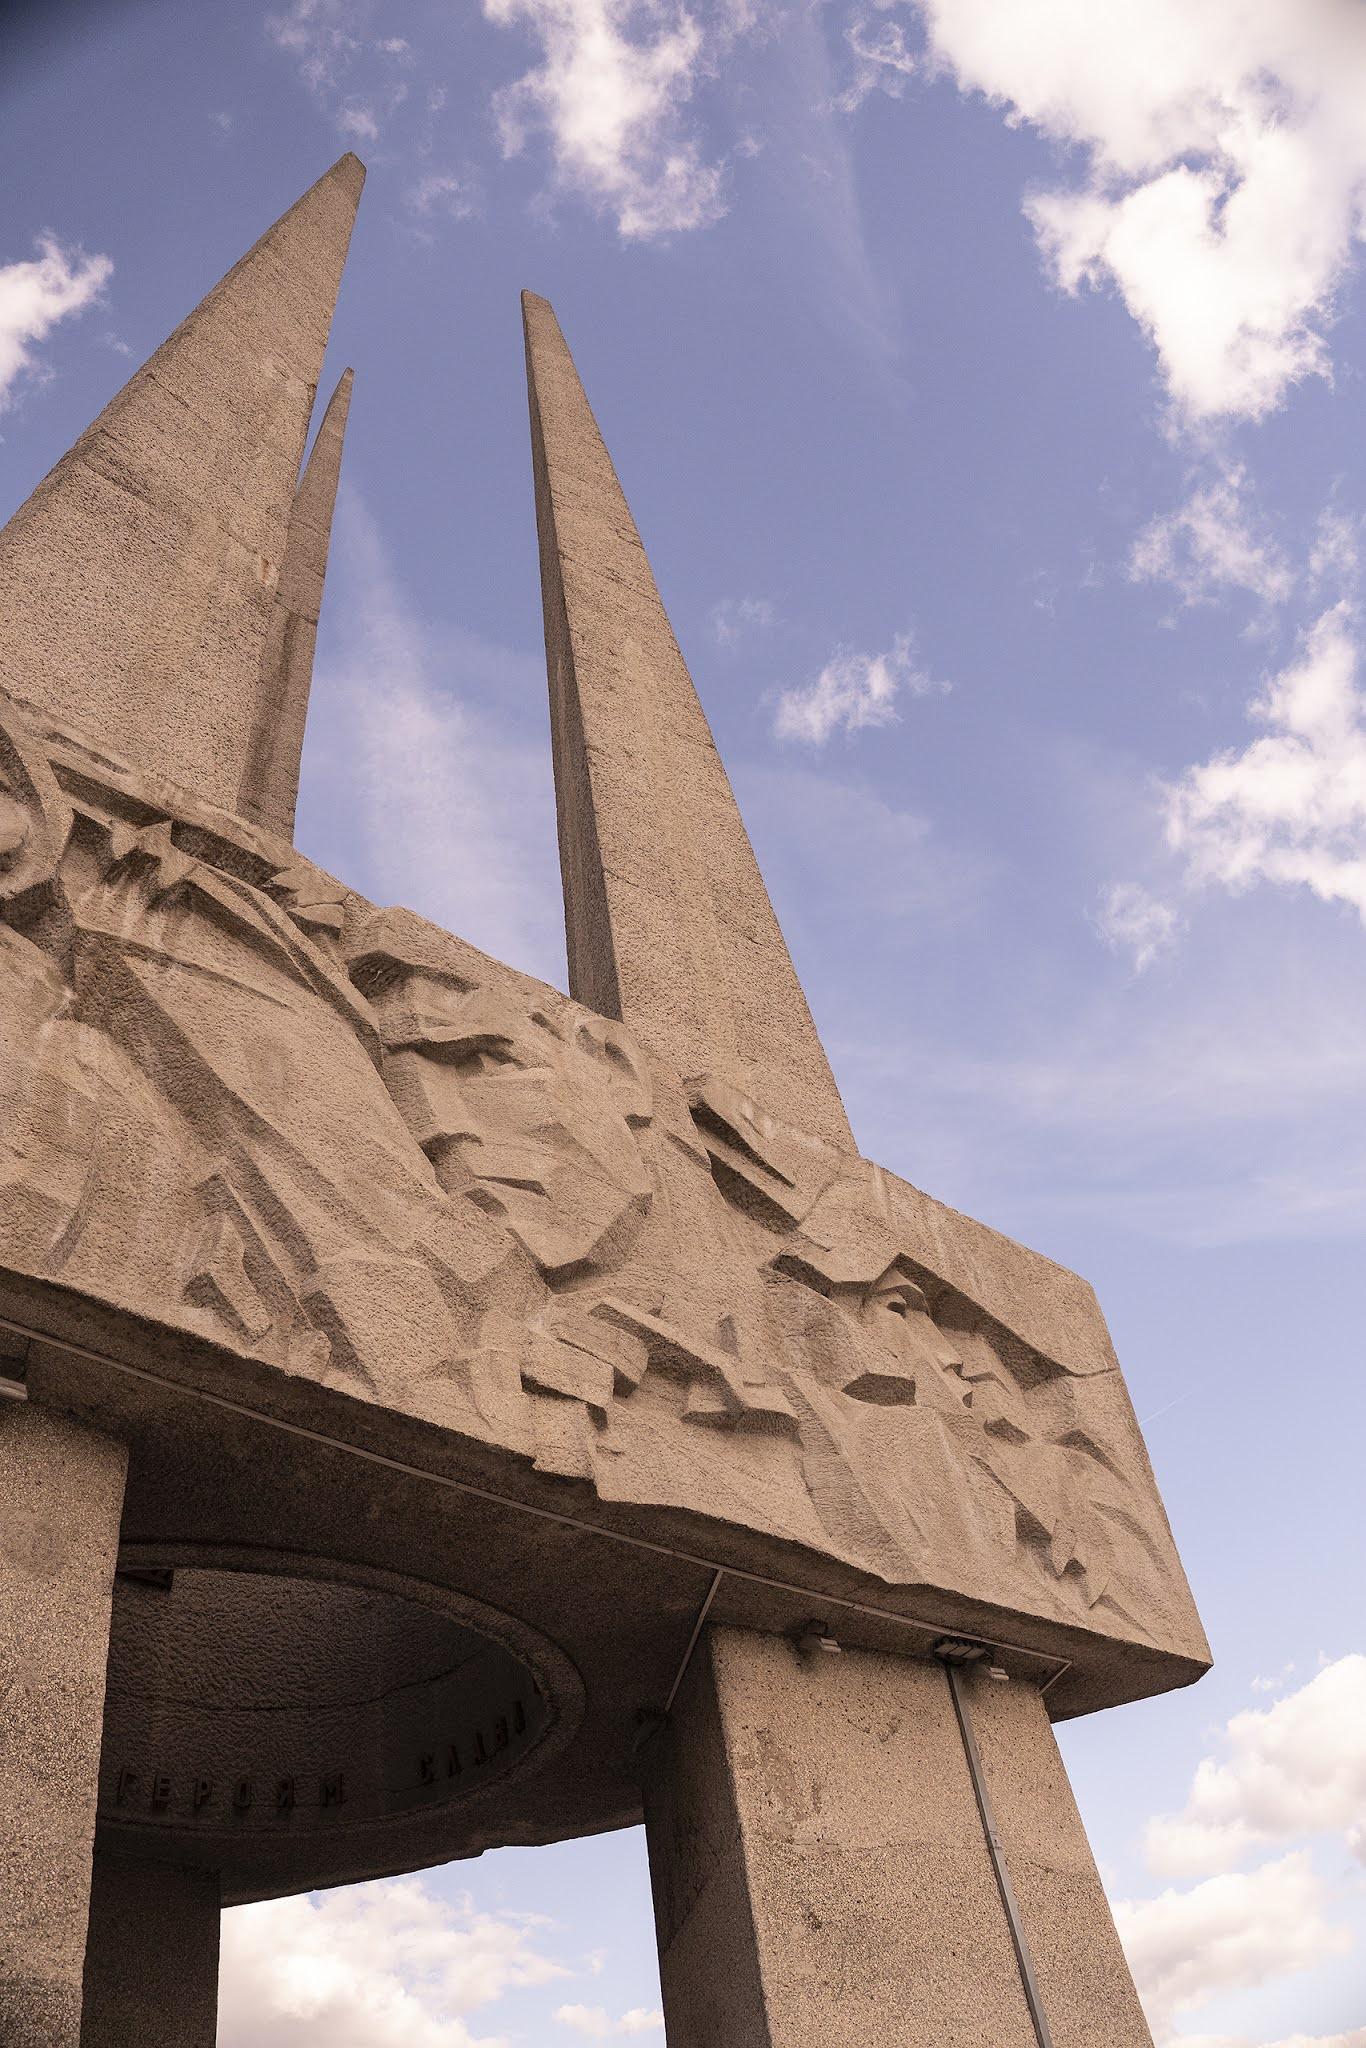 Vitebsk eternal flame WWII monument